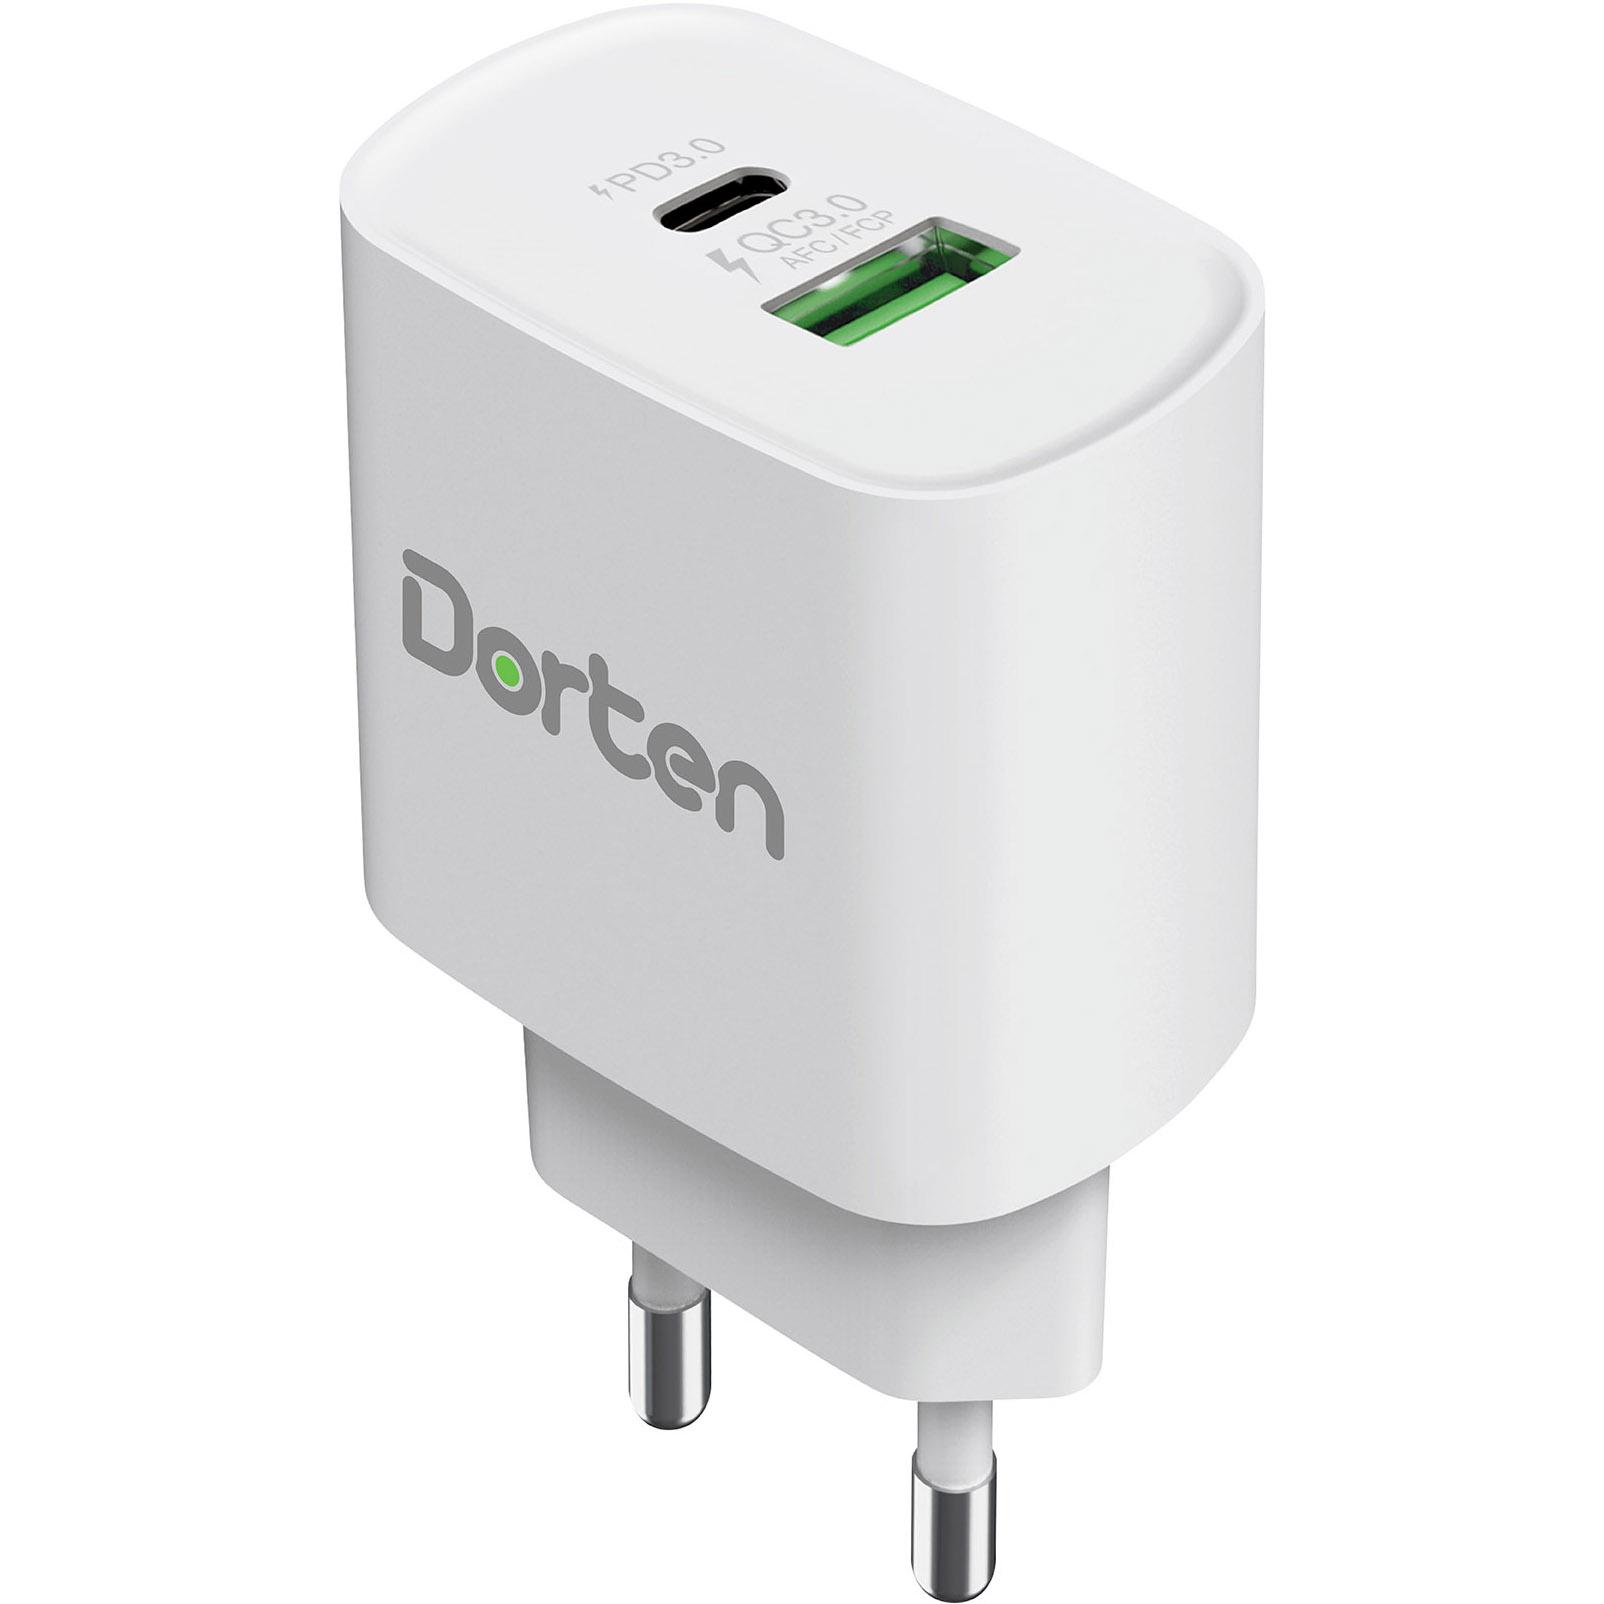 Фото - Сетевое зарядное устройство Dorten 2-Port USB 20W Wall Quick Charger PD3.0+QC3.0 белый DN206600 сетевое зарядное устройство aukey dual port wall charger pa d1 30w usb usb c черное